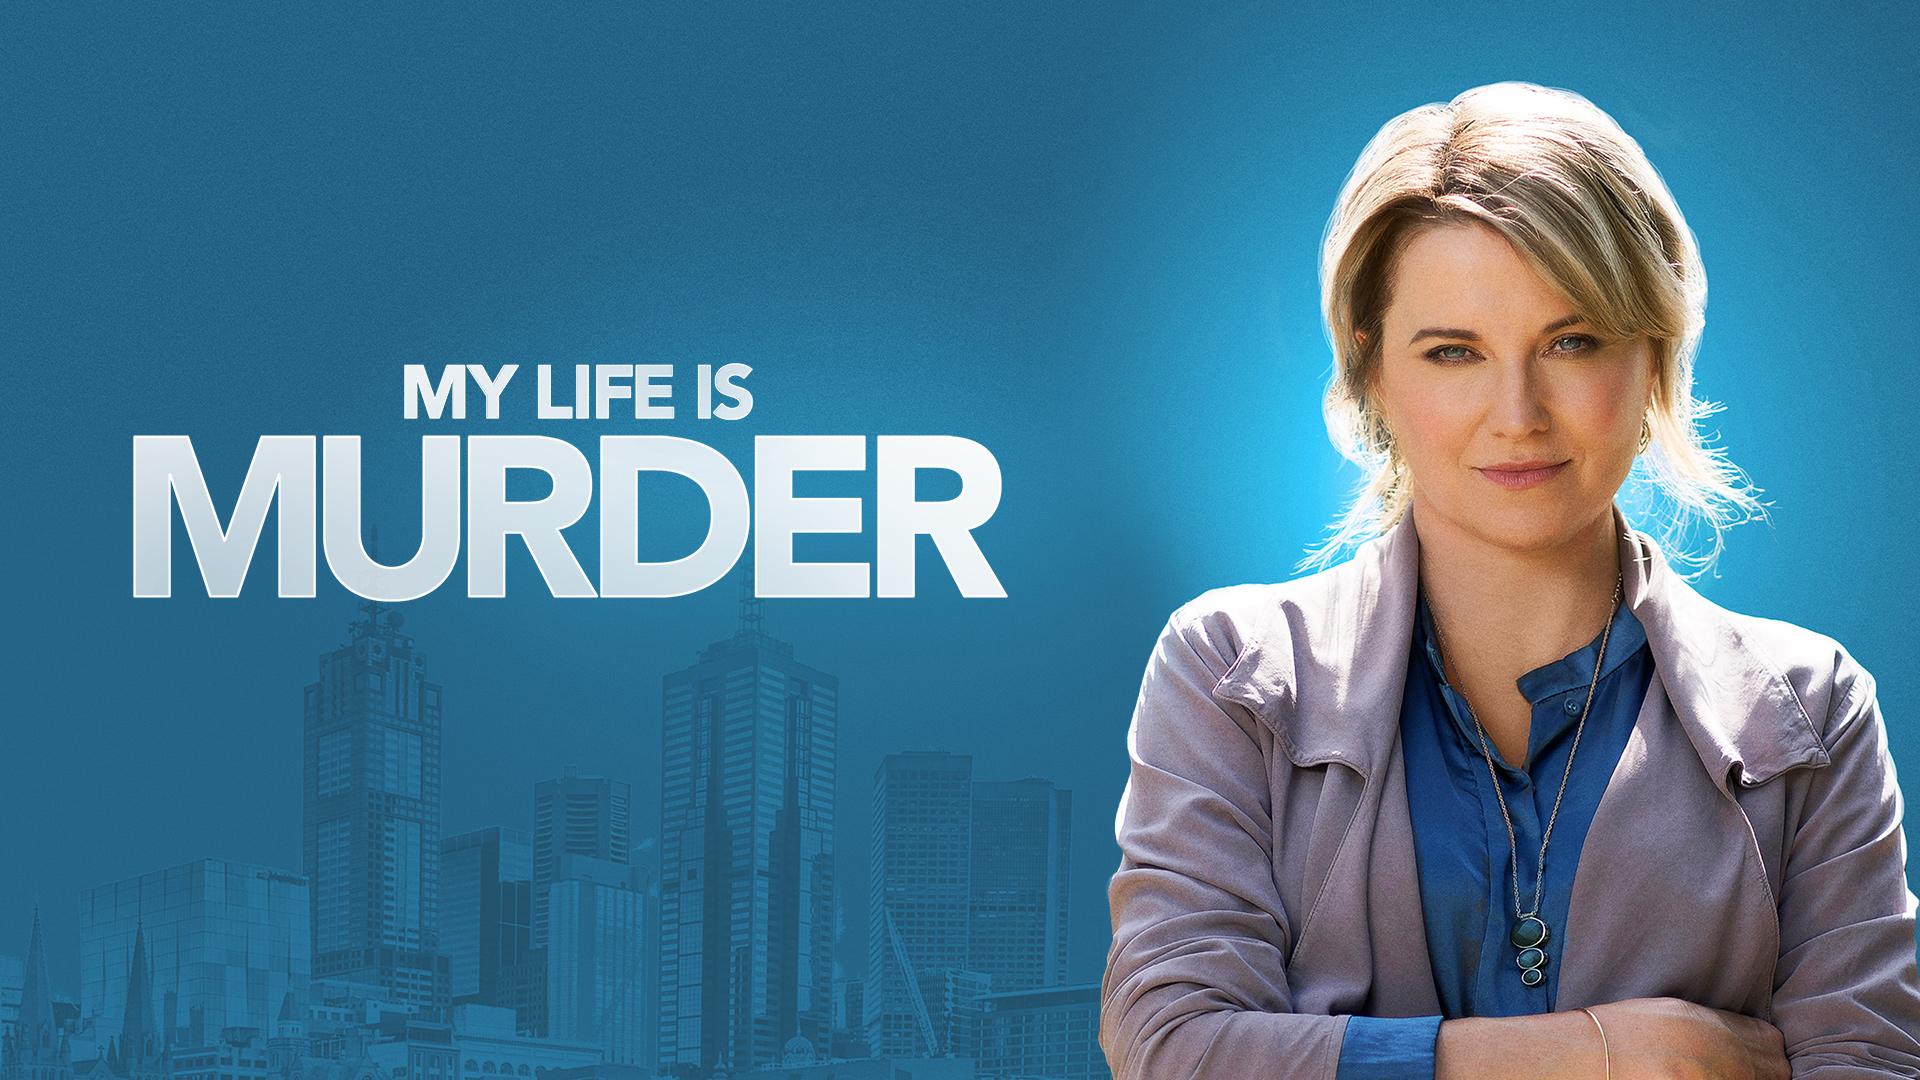 My Life is Murder - Season 1